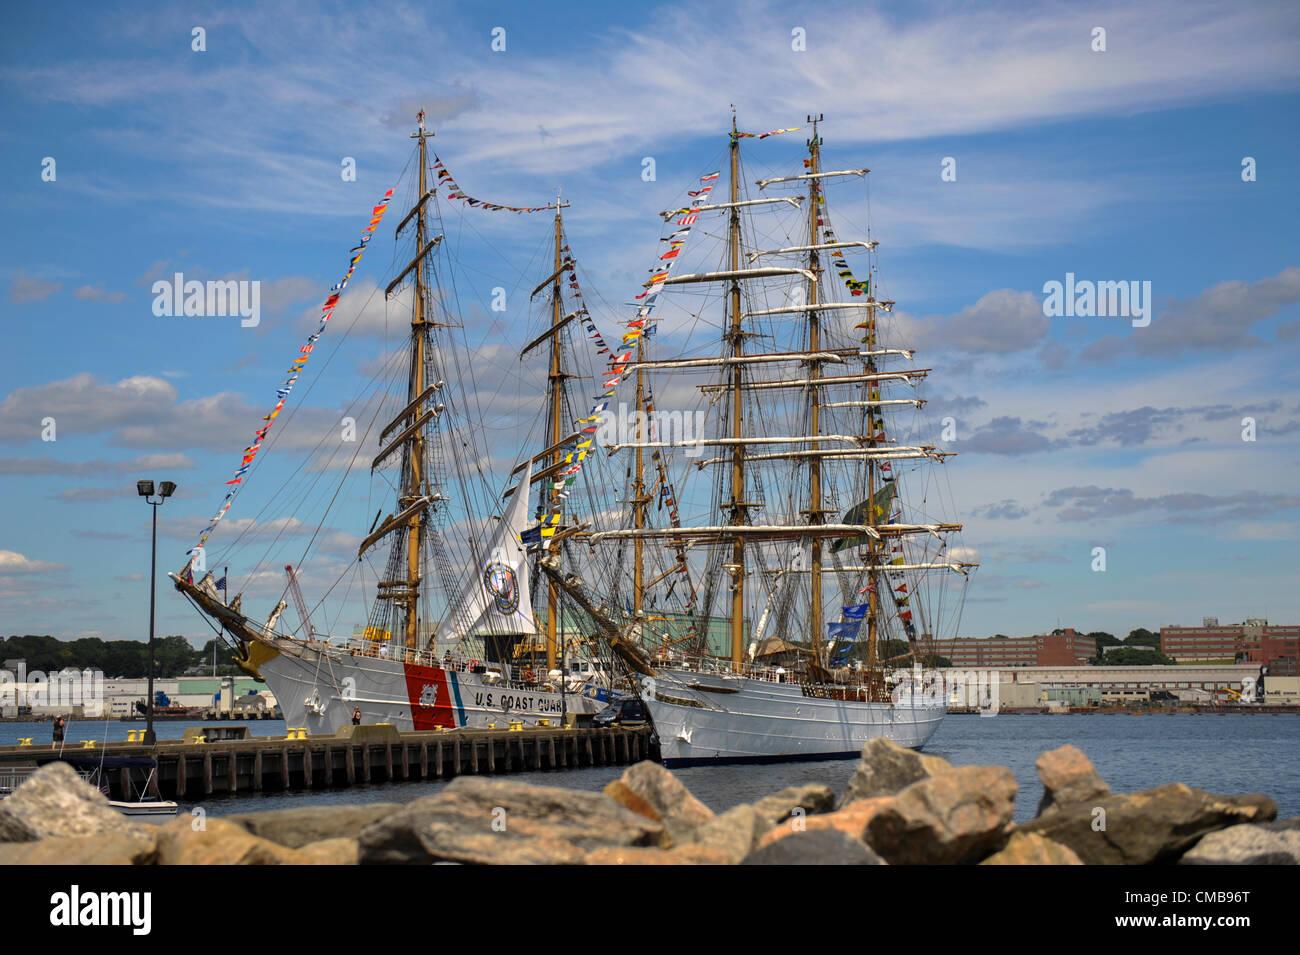 New London, Connecticut, USA - July 9, 2012: The US Coast Guard training ship Eagle and the Brazilian Navy training - Stock Image